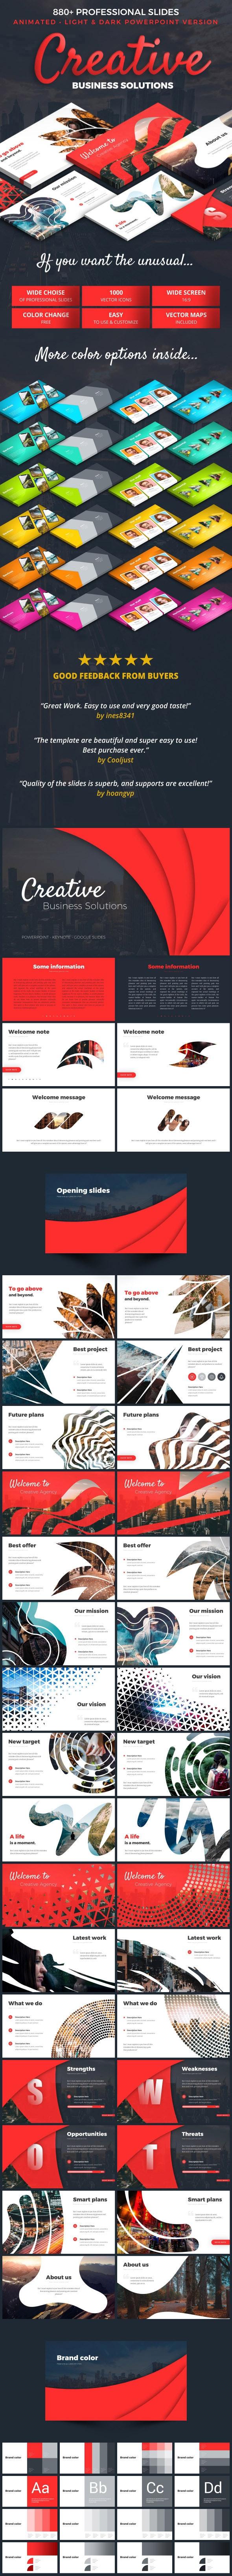 Creative Business Plan - Pitch Deck PowerPoint Templates